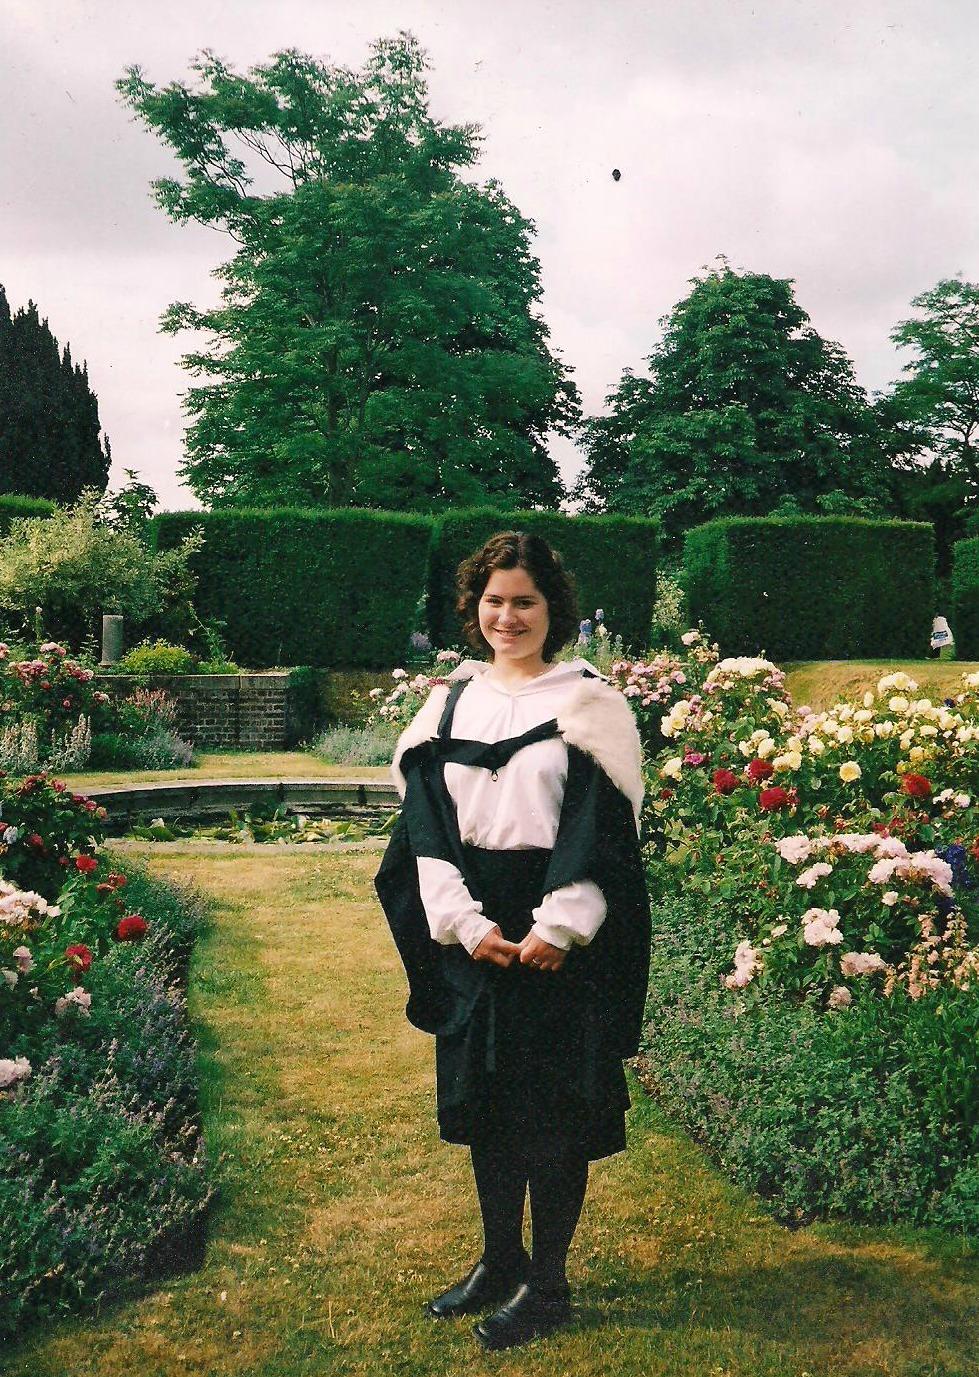 Lucy Parsons BA Graduation Newnham College, Cambridge